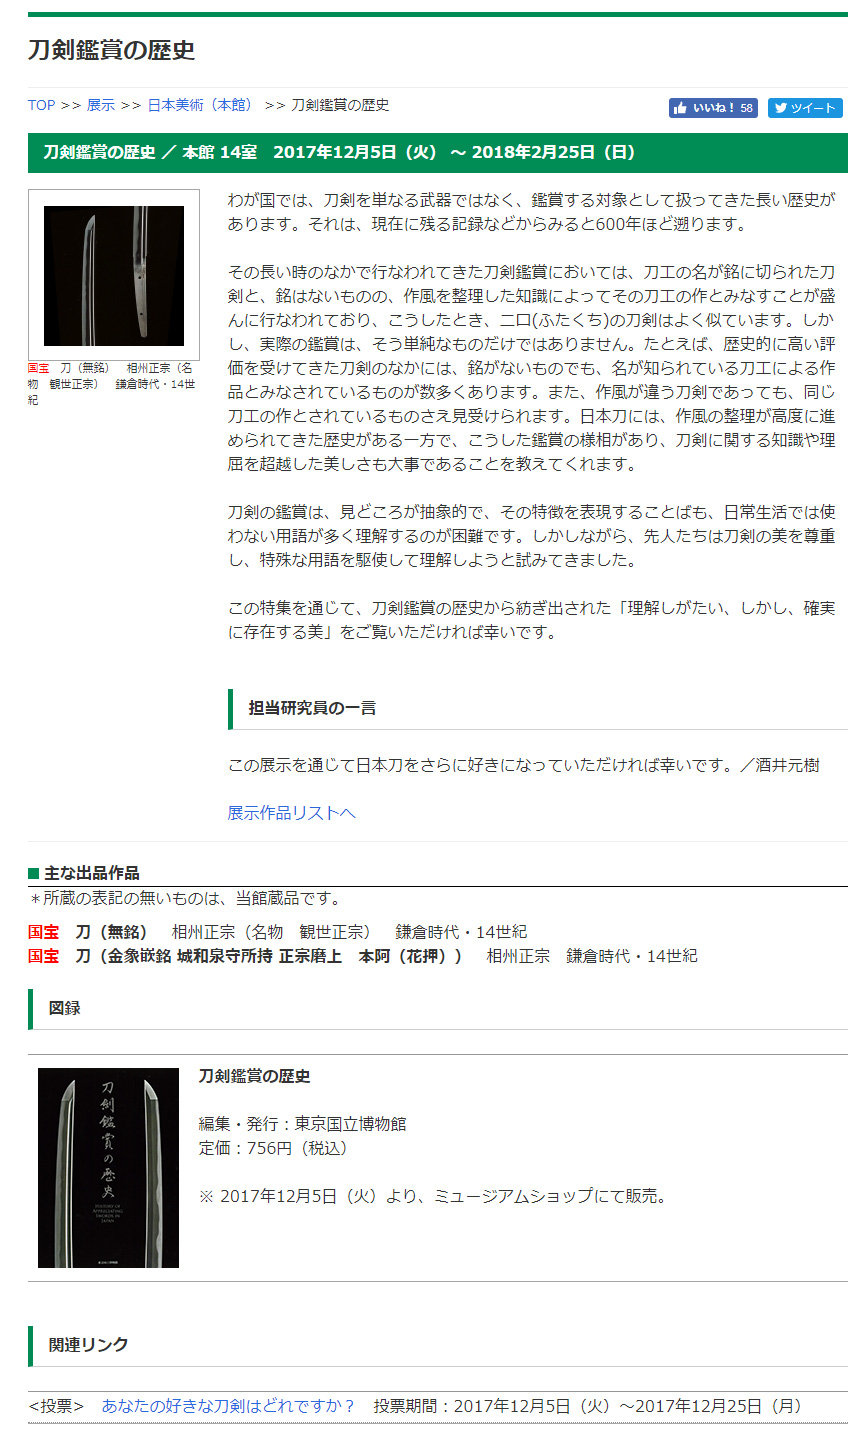 171210tokyo_national_museum2.jpg